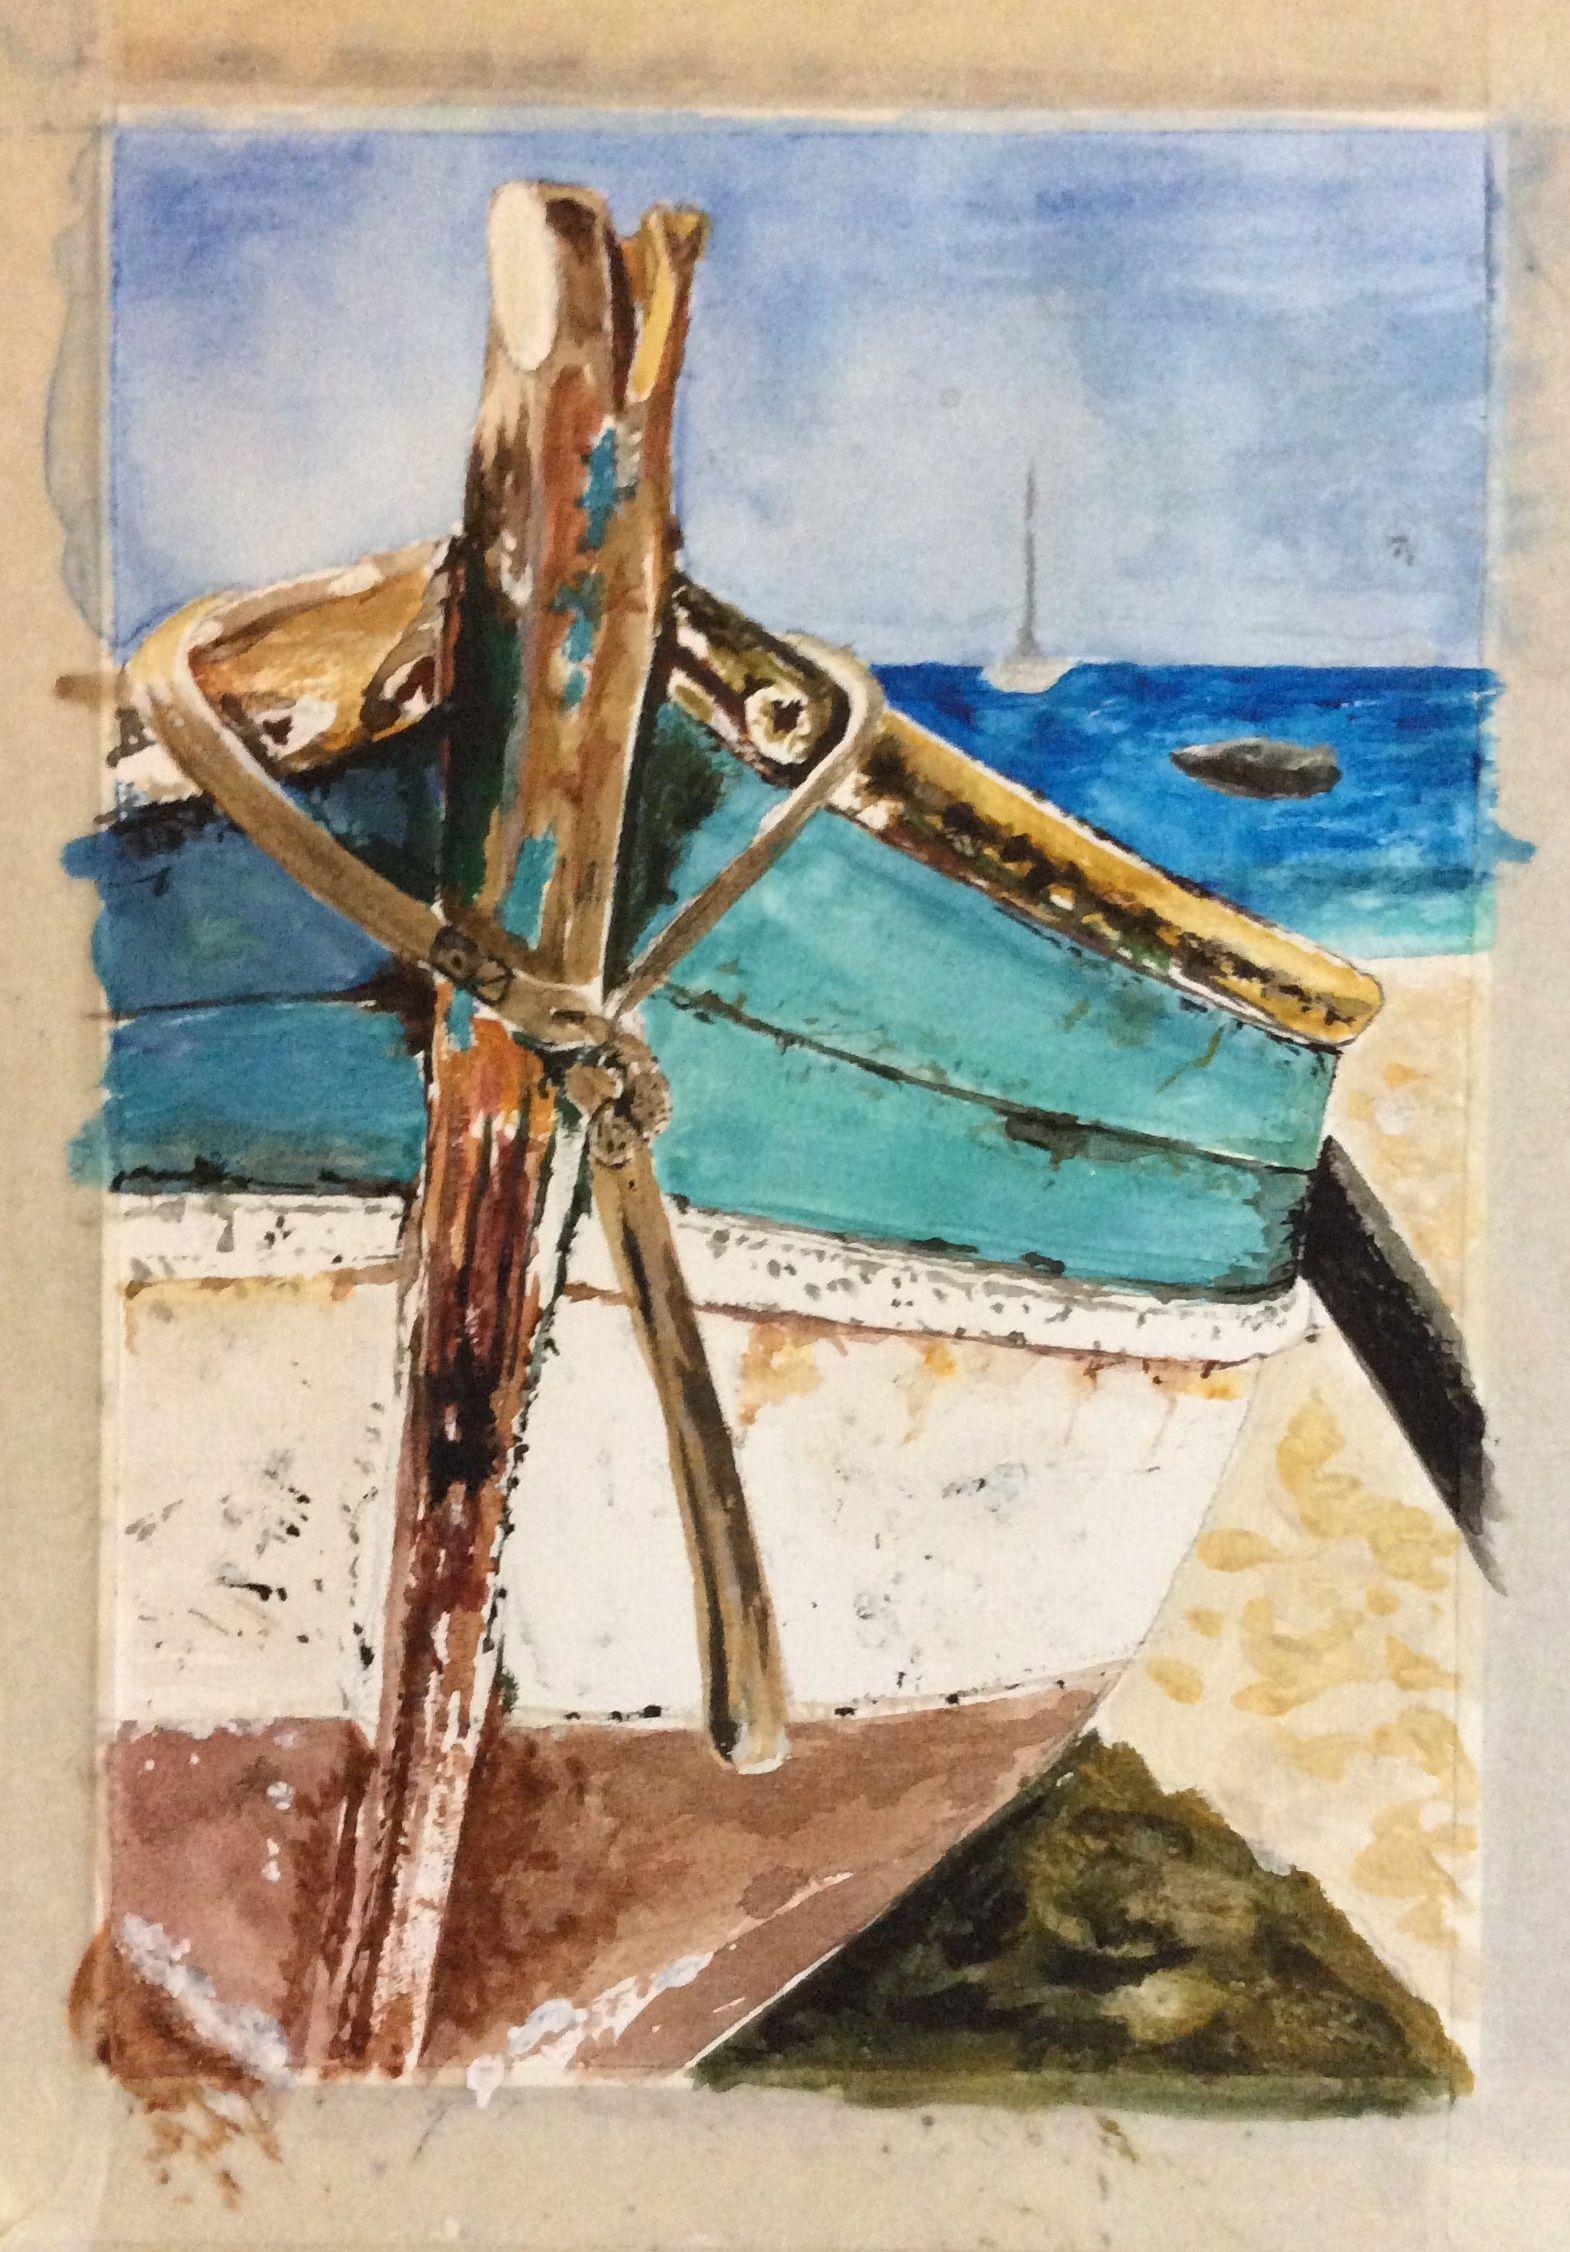 Broken Seaside Peinture Bateau Plage Aquarelle